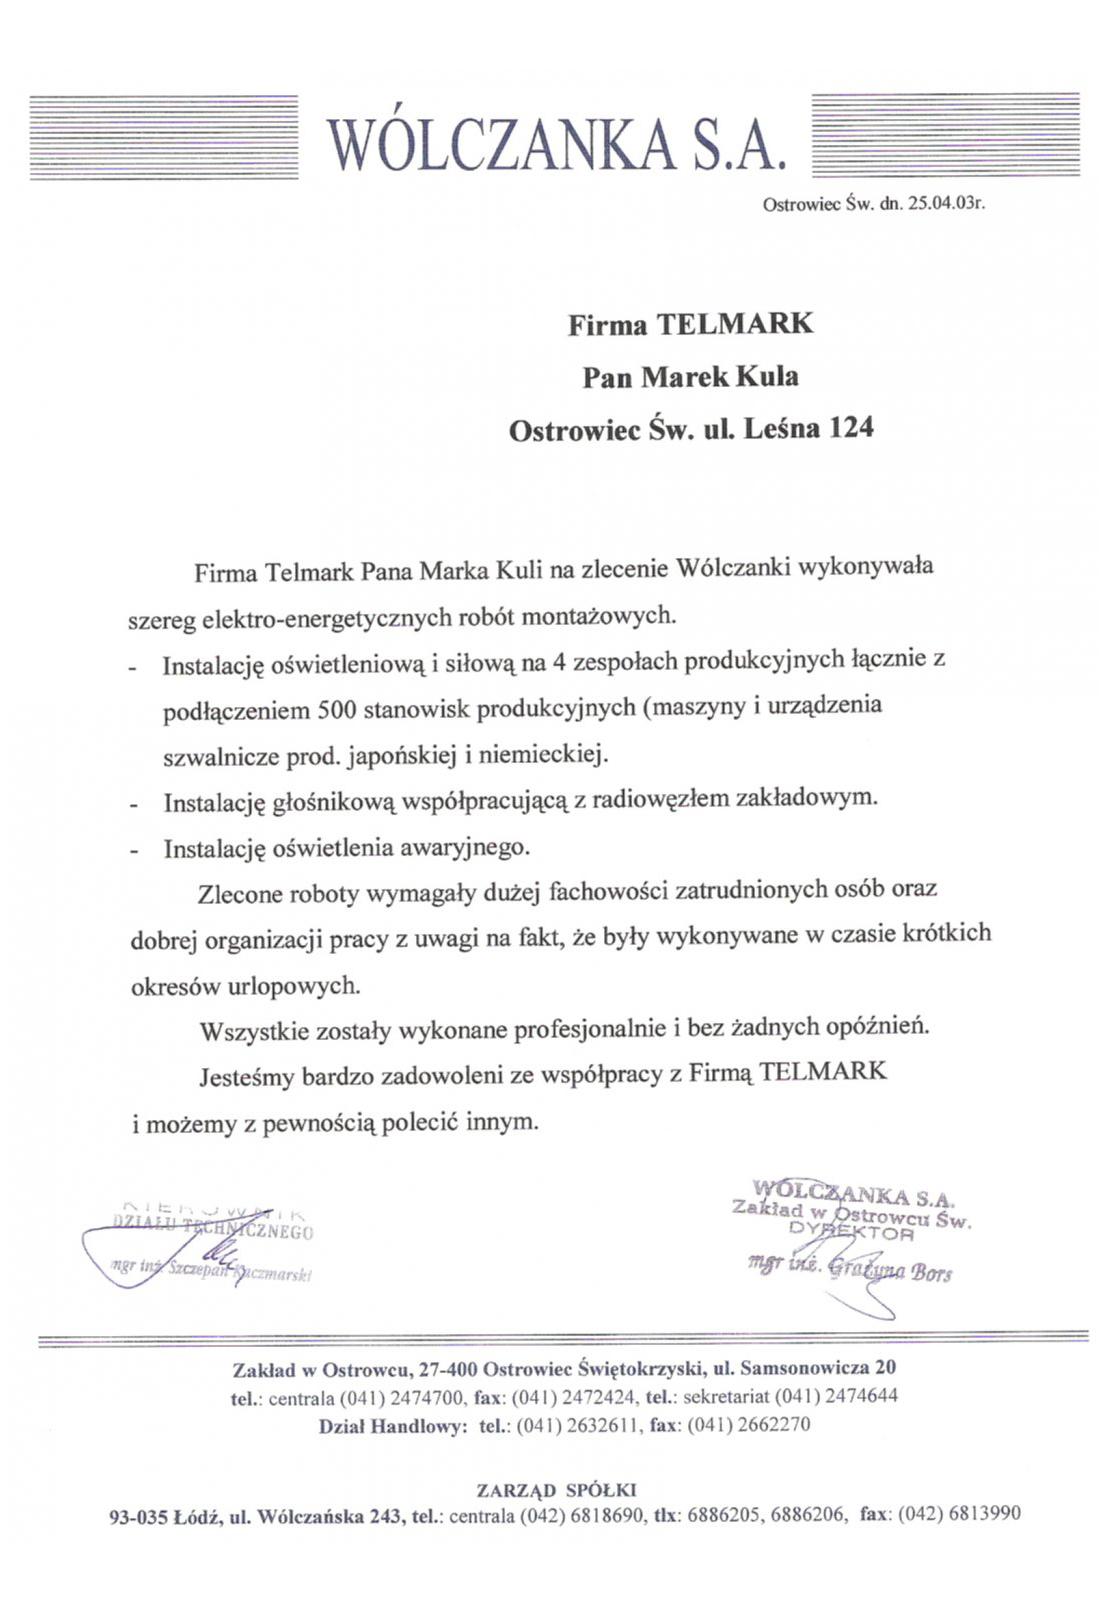 phoca_thumb_l_wlczanka22